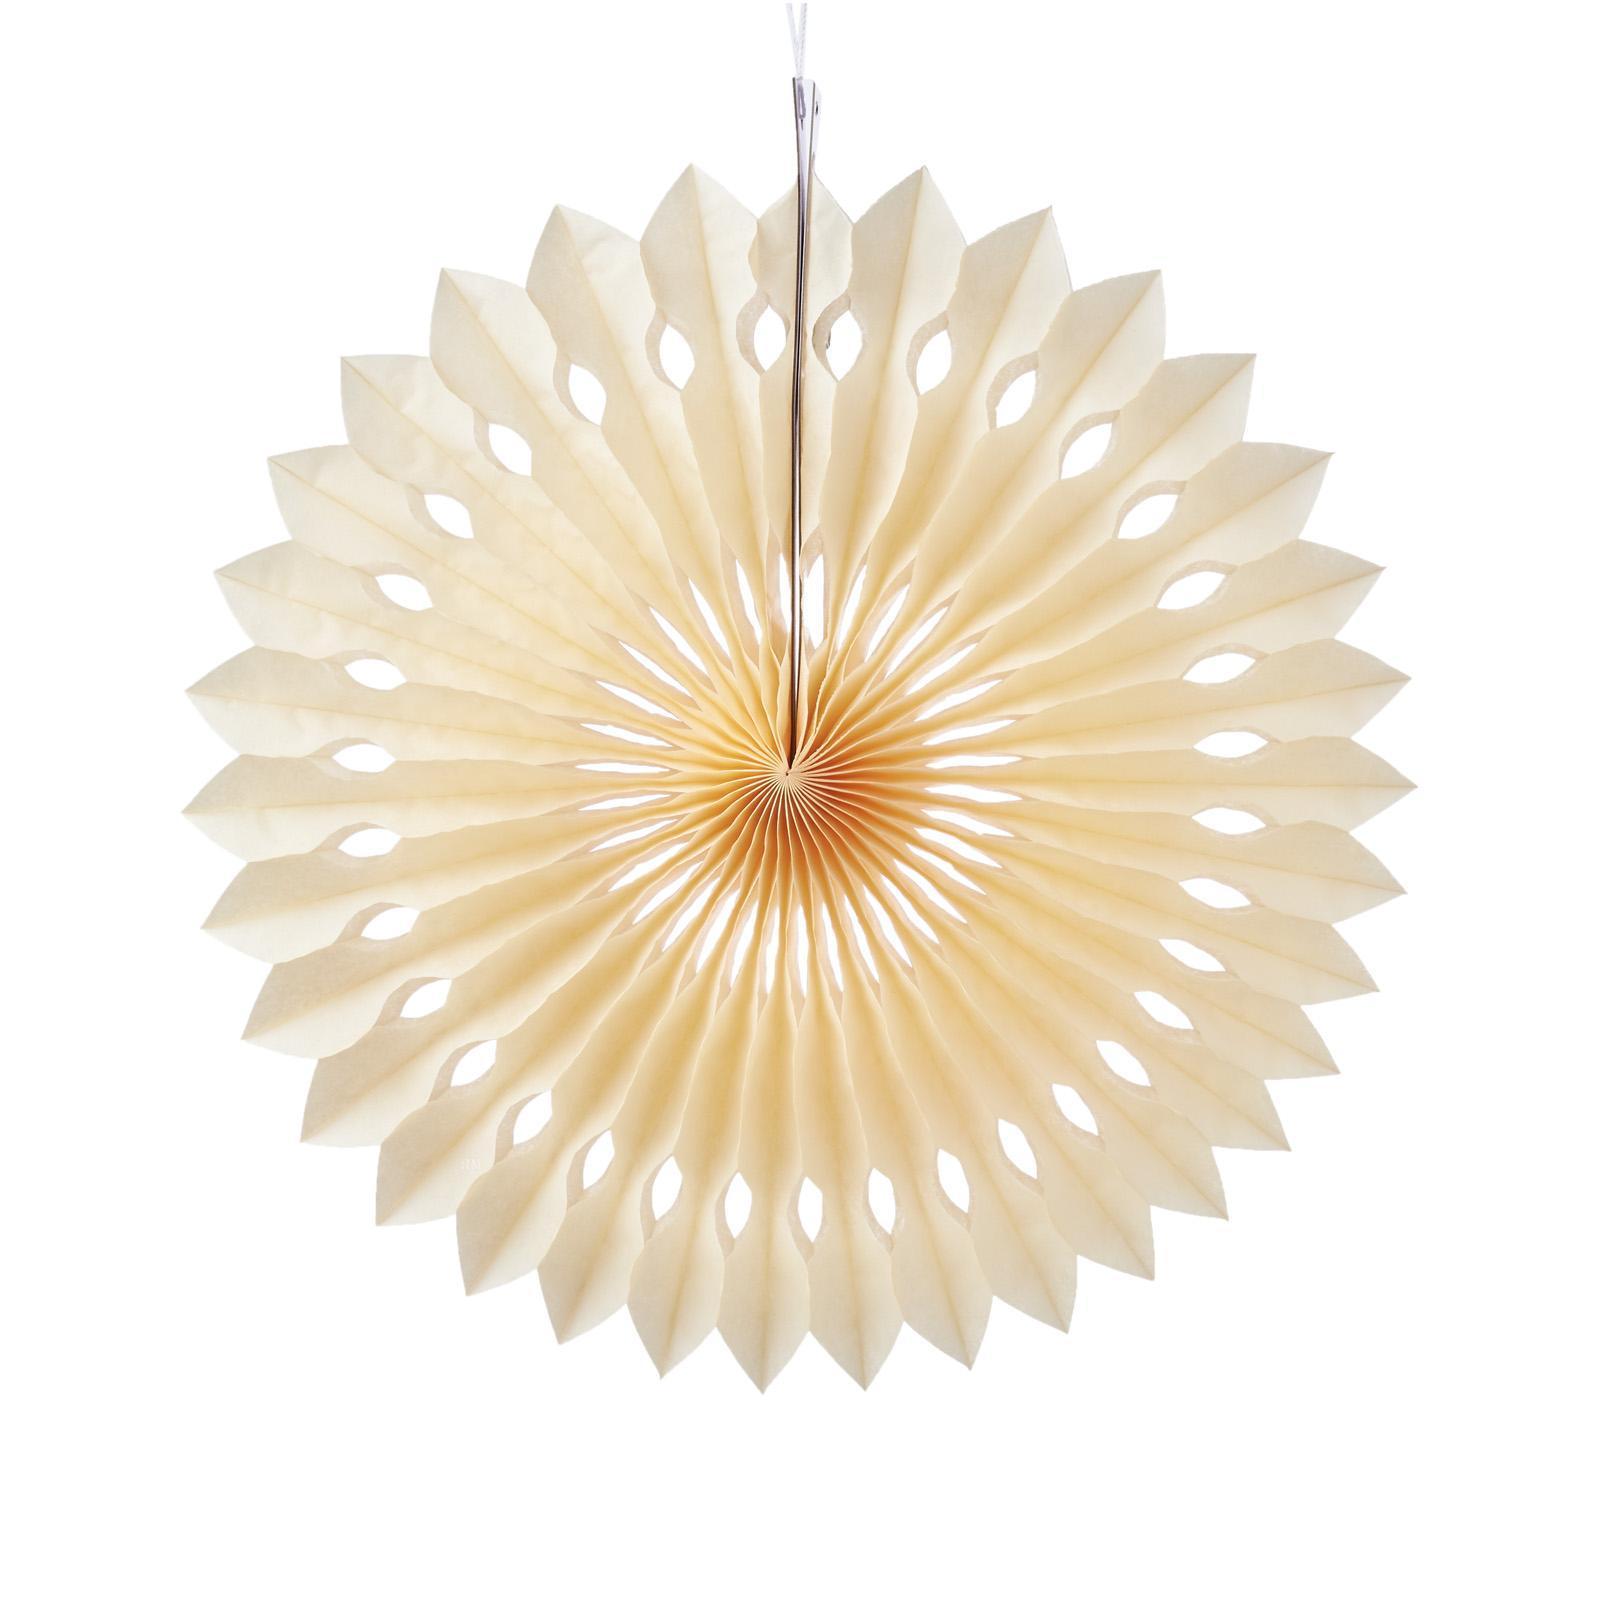 Misty Daydream Pinwheel Paper Flower Fans (02 - Ivory)(Medium 30cm)(Cut-Out)